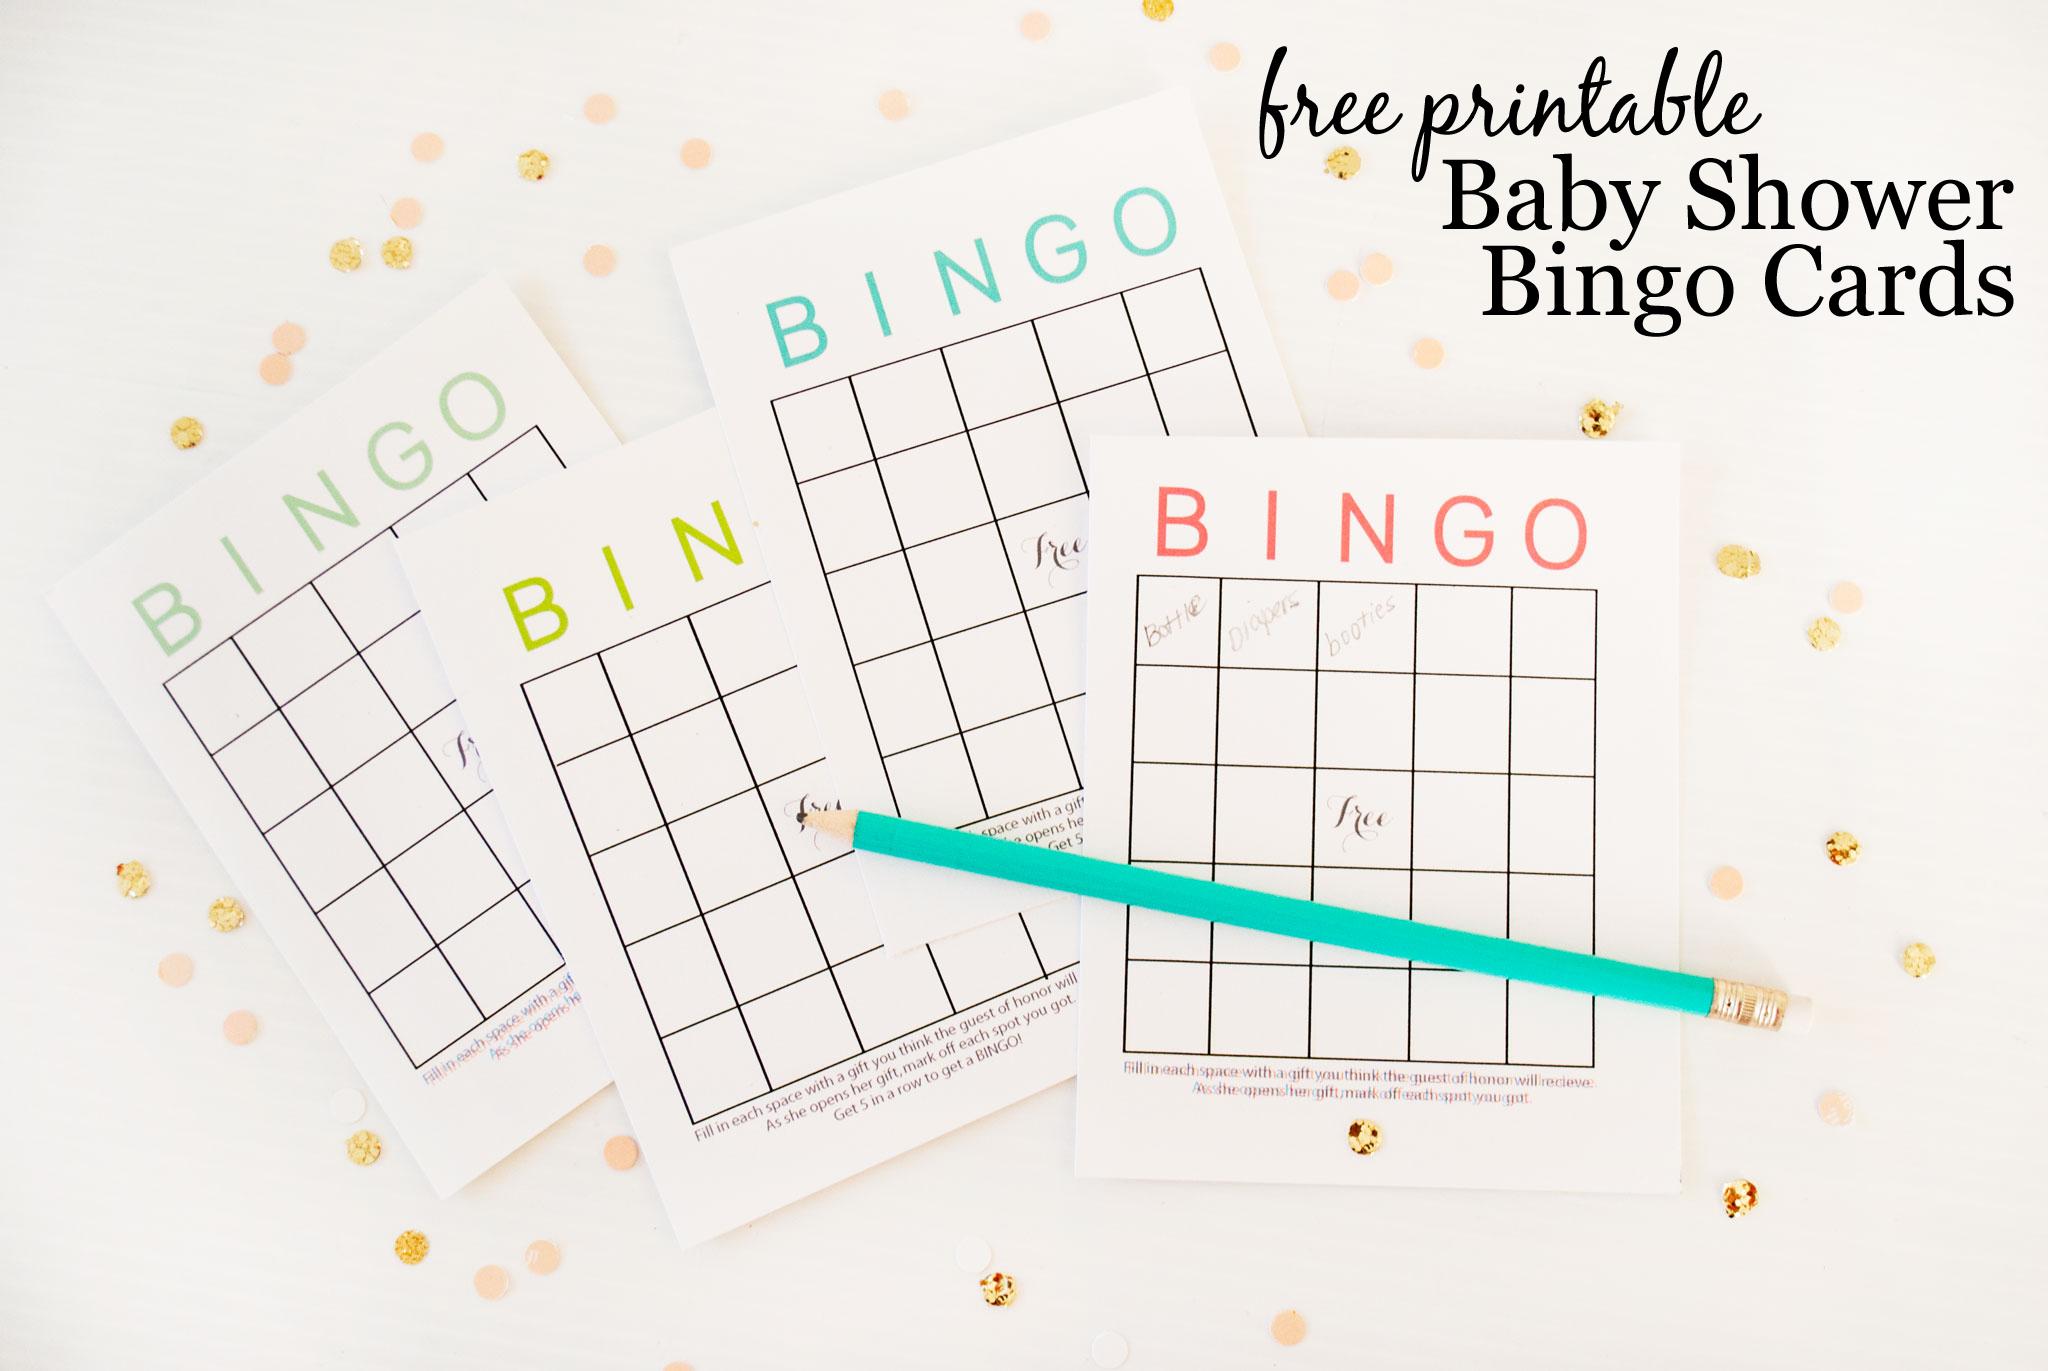 Free Printable Baby Shower Bingo Cards - Project Nursery